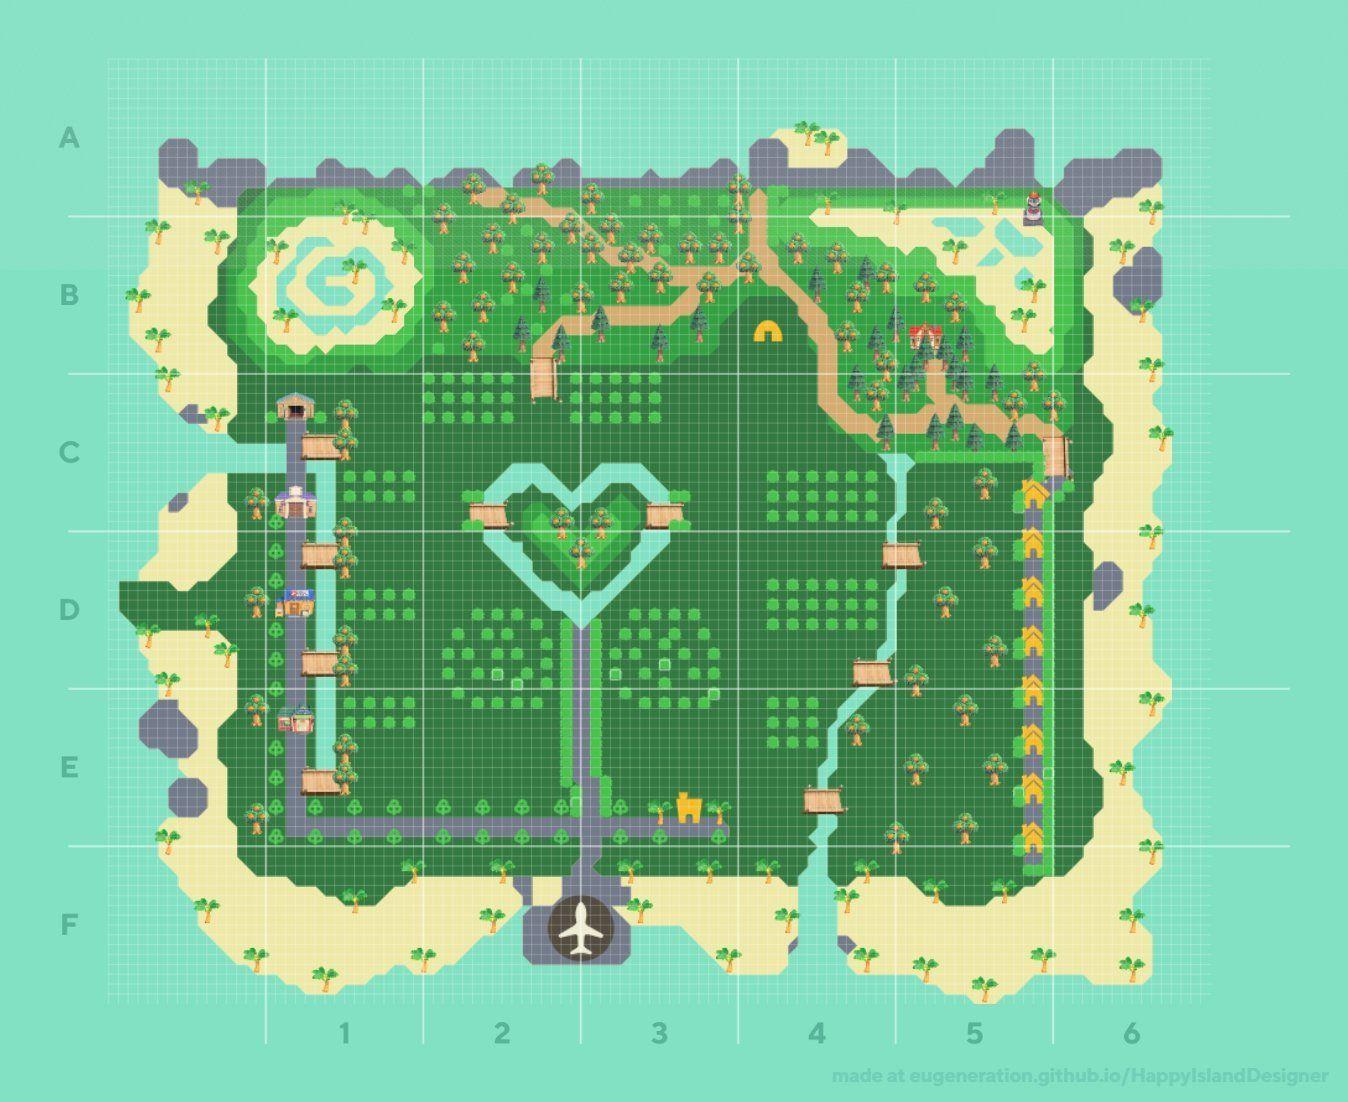 Happy Island Designer Guide Animal Crossing New Horizons Map Planner Crossingcharm Acnh Island Des In 2020 Animal Crossing New Animal Crossing Animal Crossing Qr